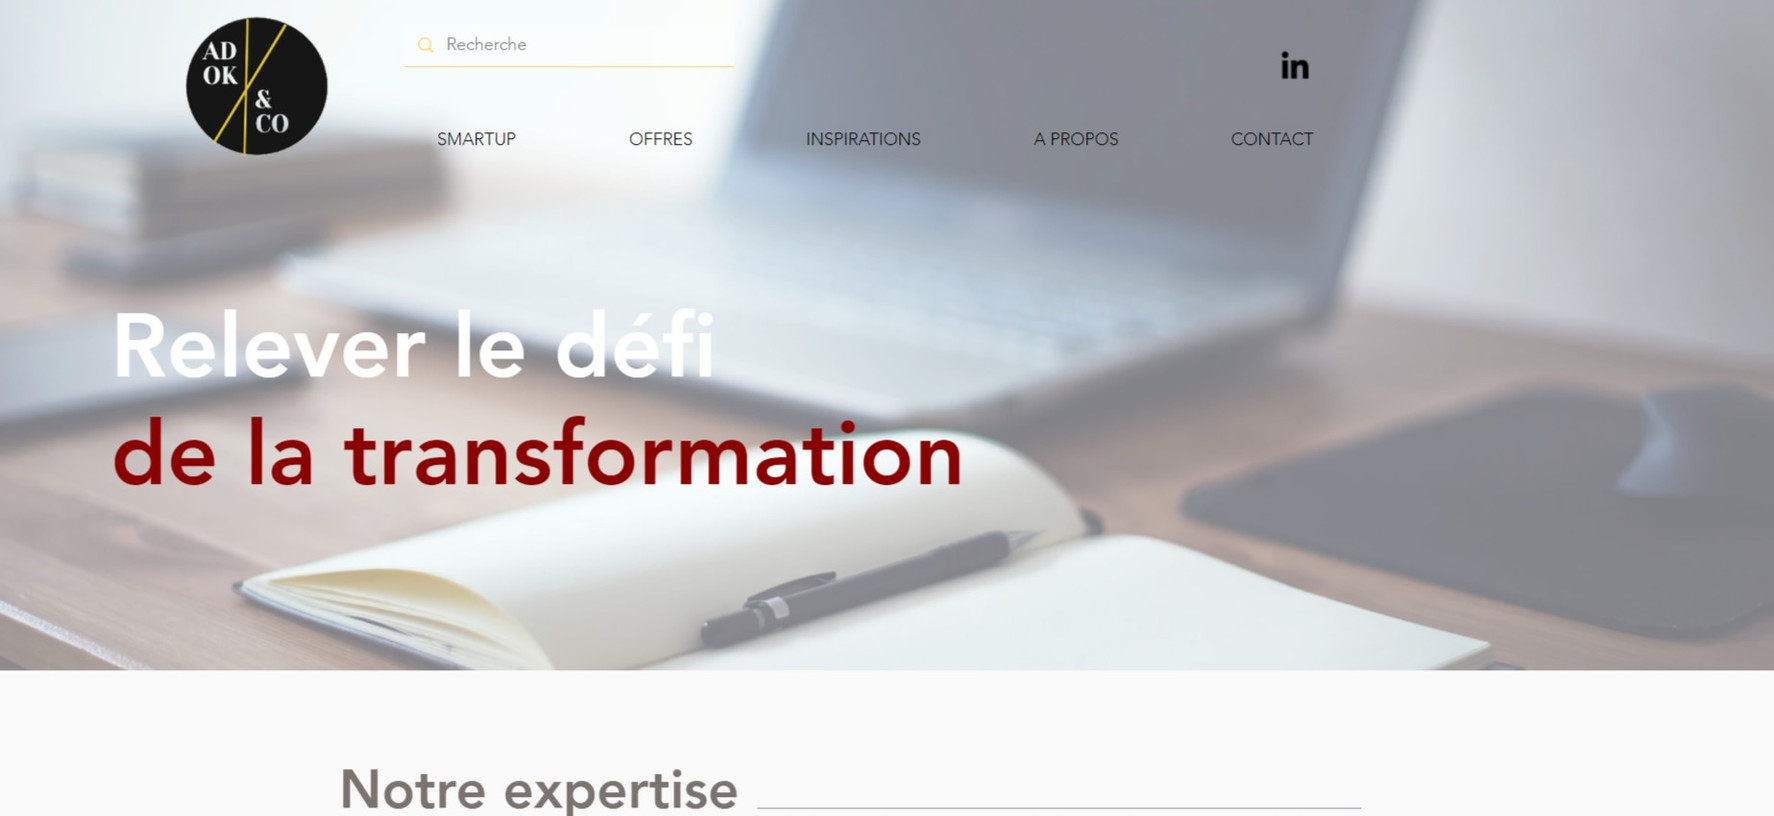 Site - ADOK&CO.jpg